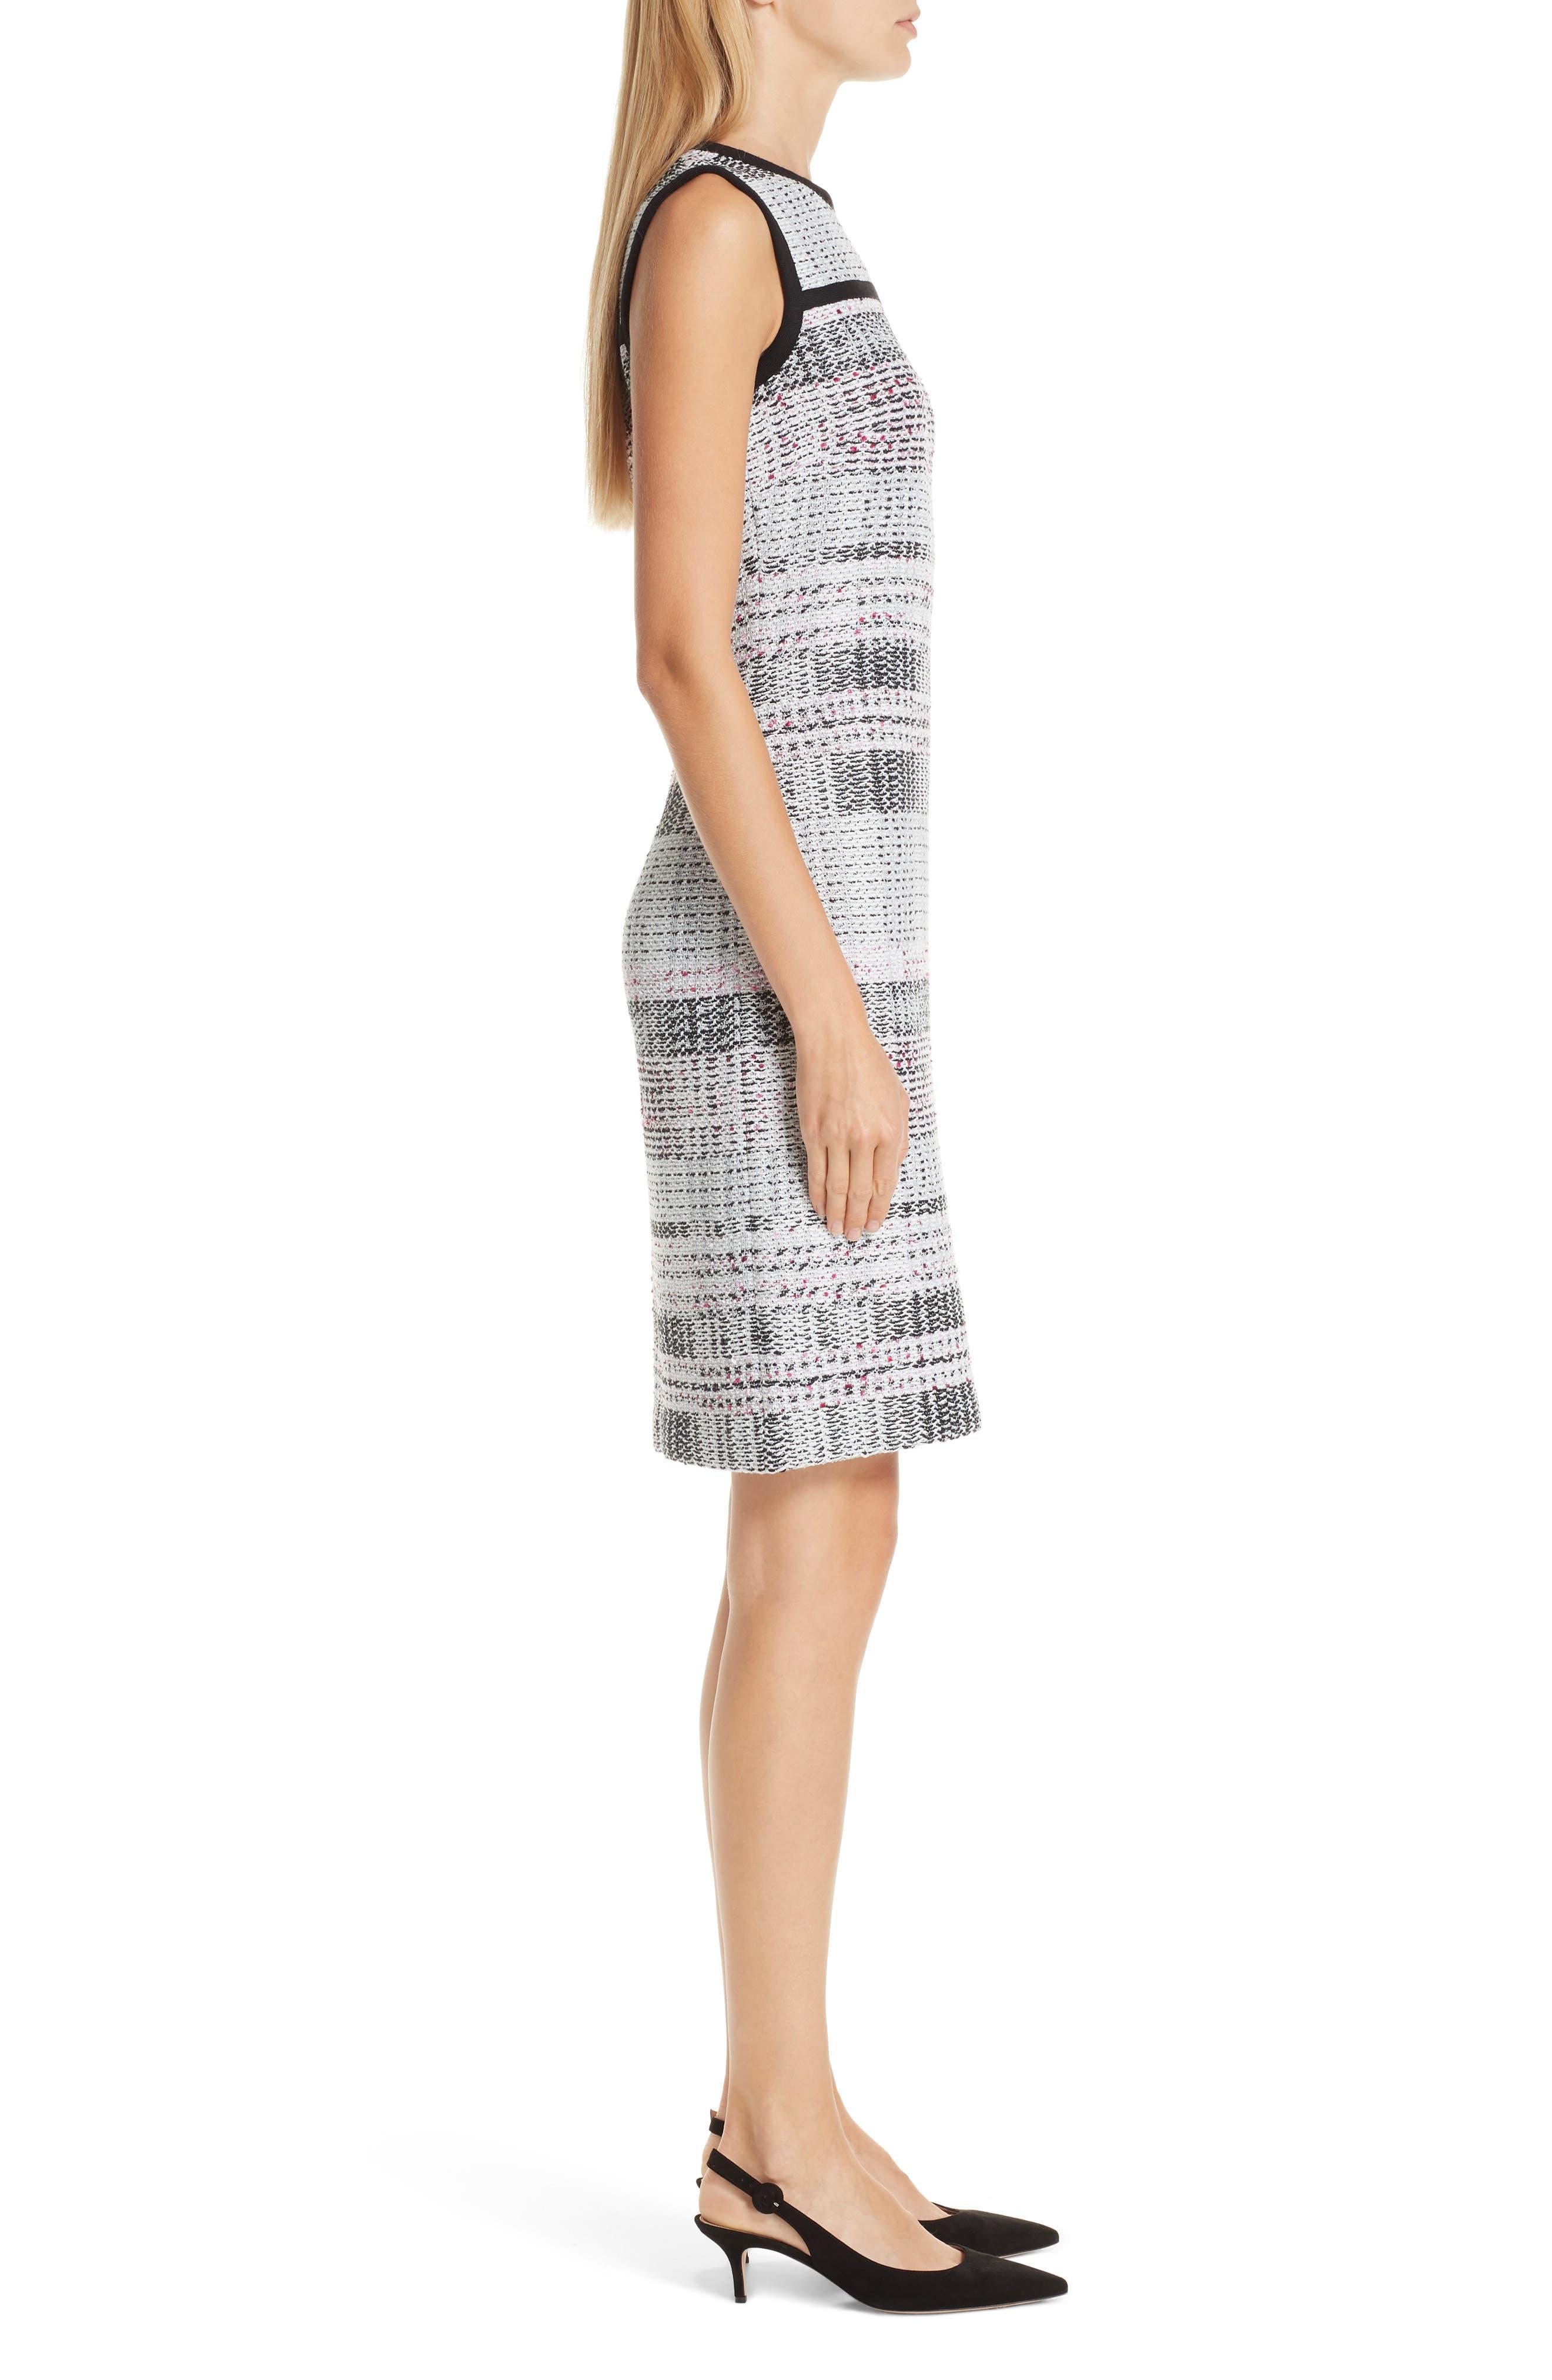 ST. JOHN COLLECTION, Bianca Plaid Knit Sheath Dress, Alternate thumbnail 4, color, GREY MULTI